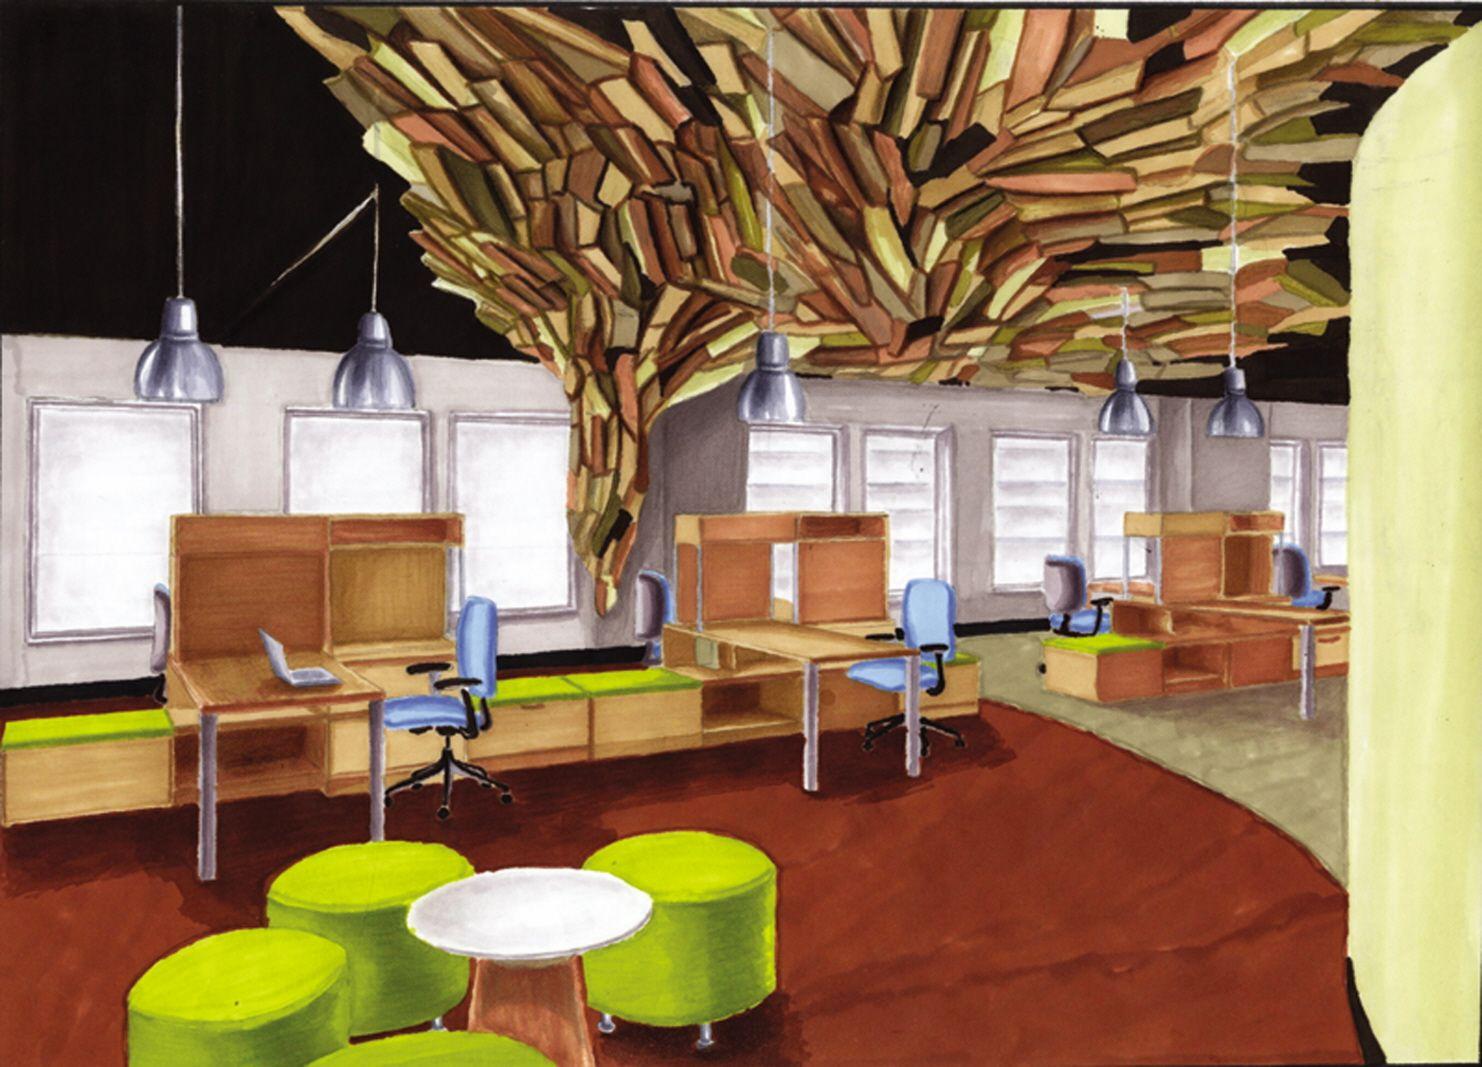 Innovative Home Office Ideas: An Innovative Office Design To Help